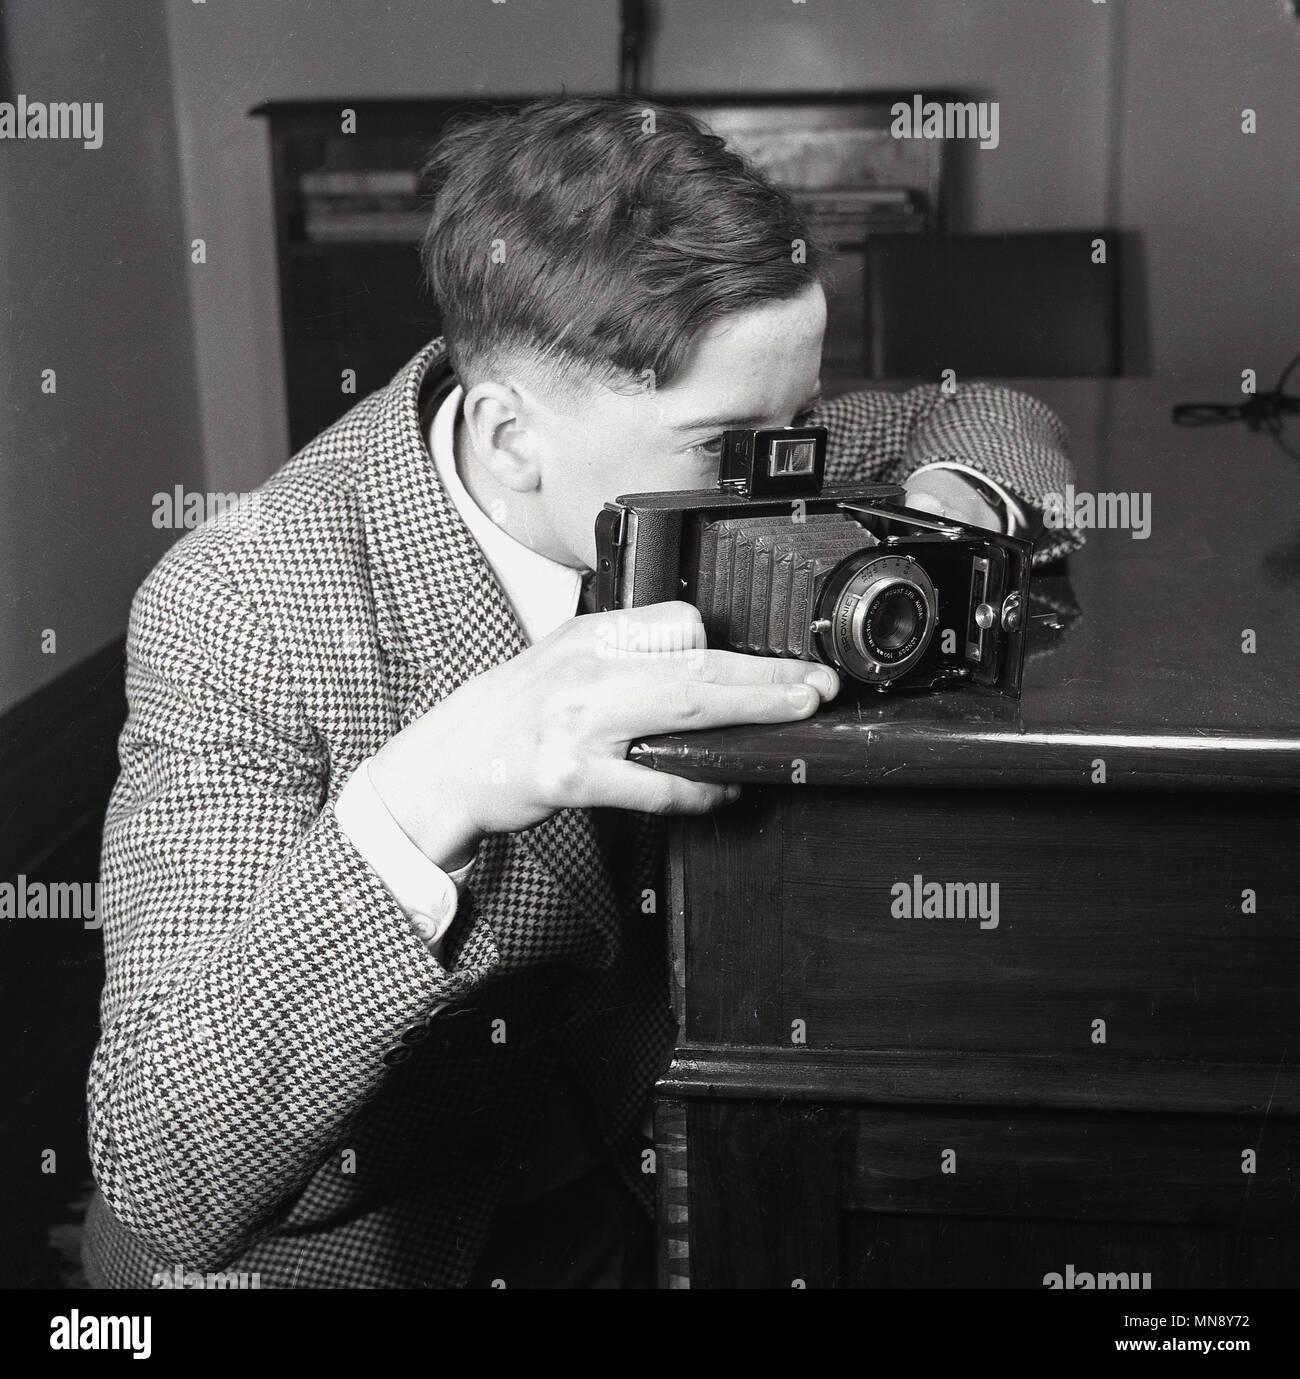 Kodak lentilles datant ami datant mon ex GF